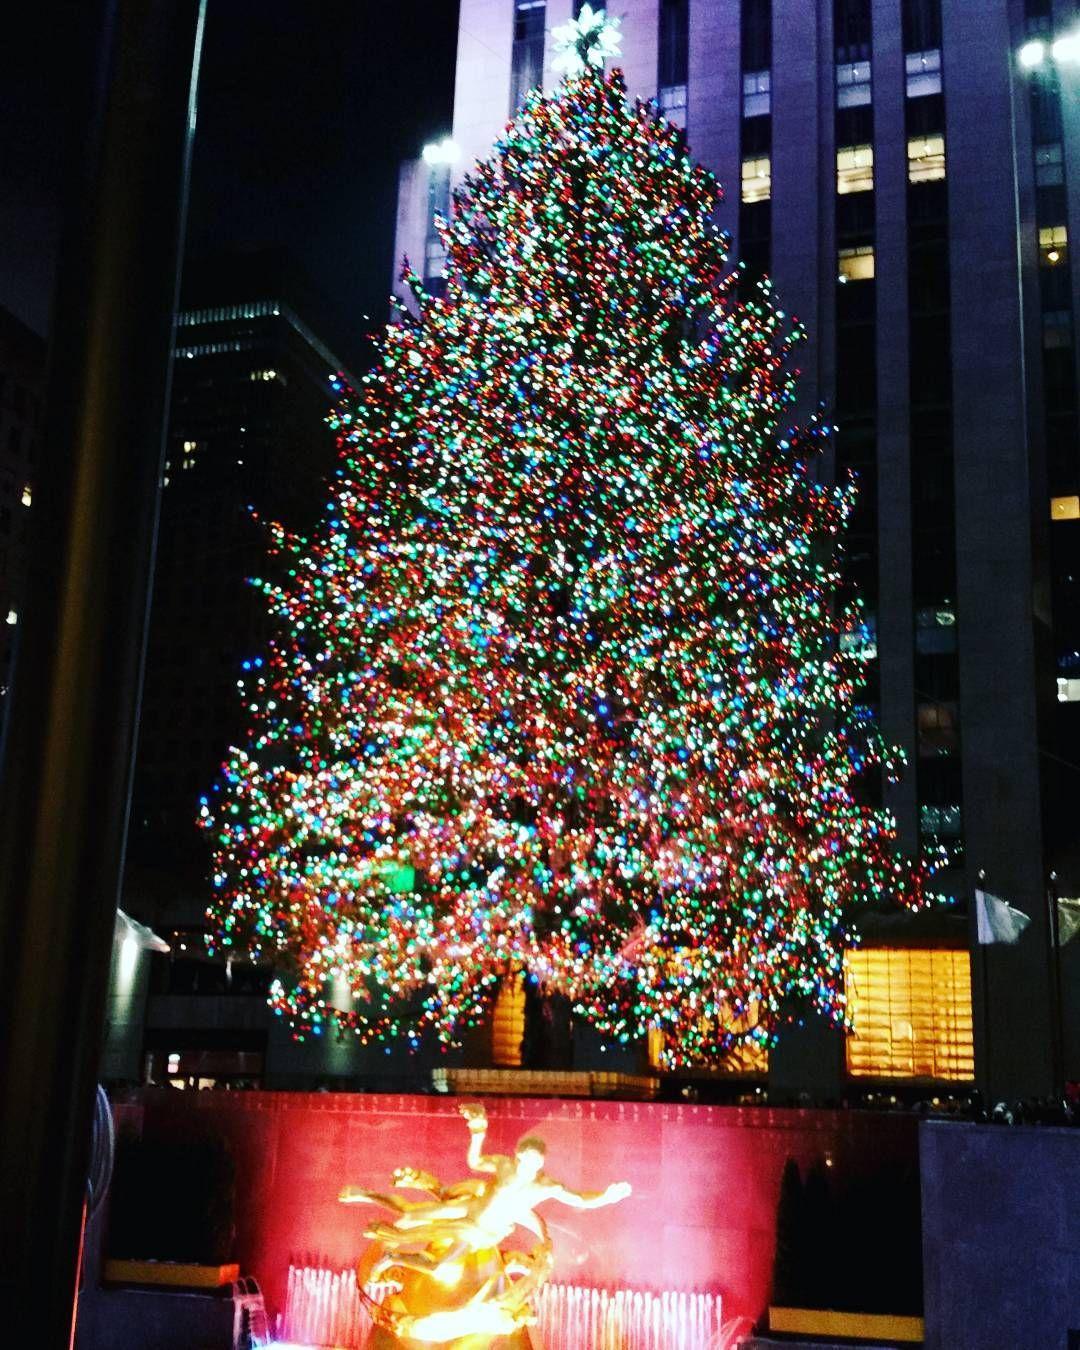 Enjoy this beautiful sight at #RockerfellerCenter! #MerryChristmas #NYC #RockefellerChristmasTree